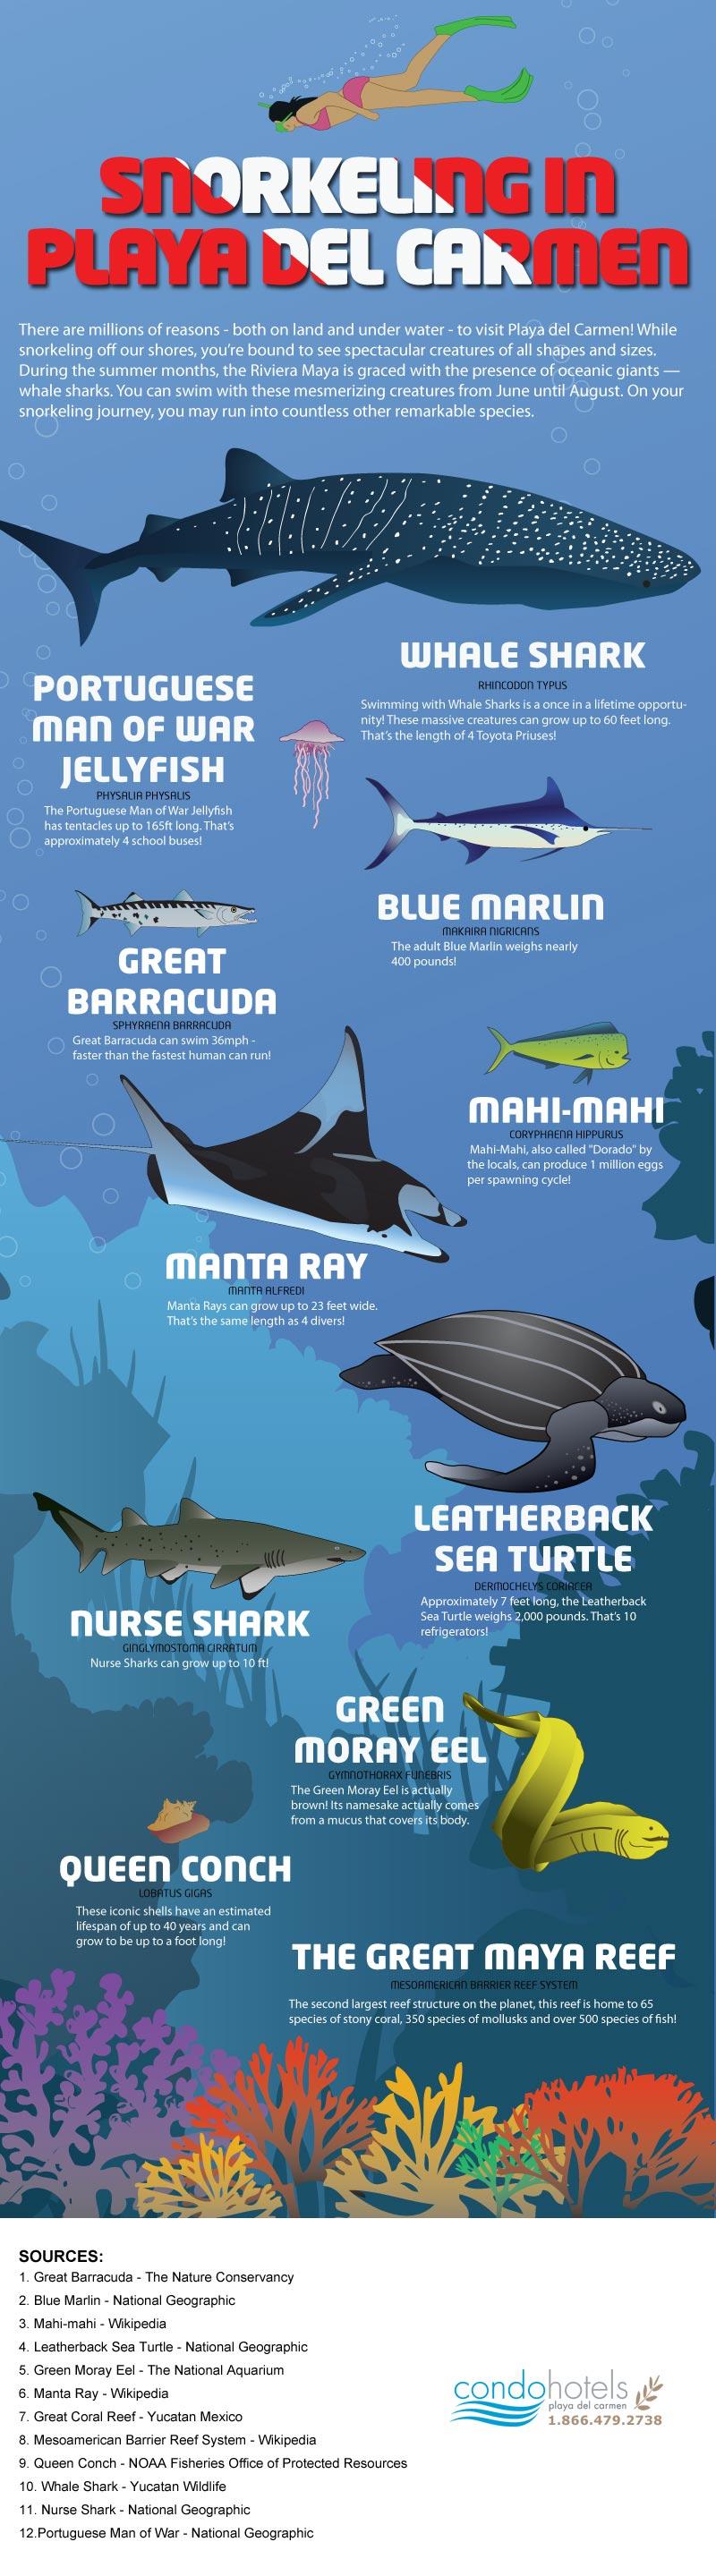 Snorkeling in Playa del Carmen Infographic - Condo Hotels Playa del Carmen